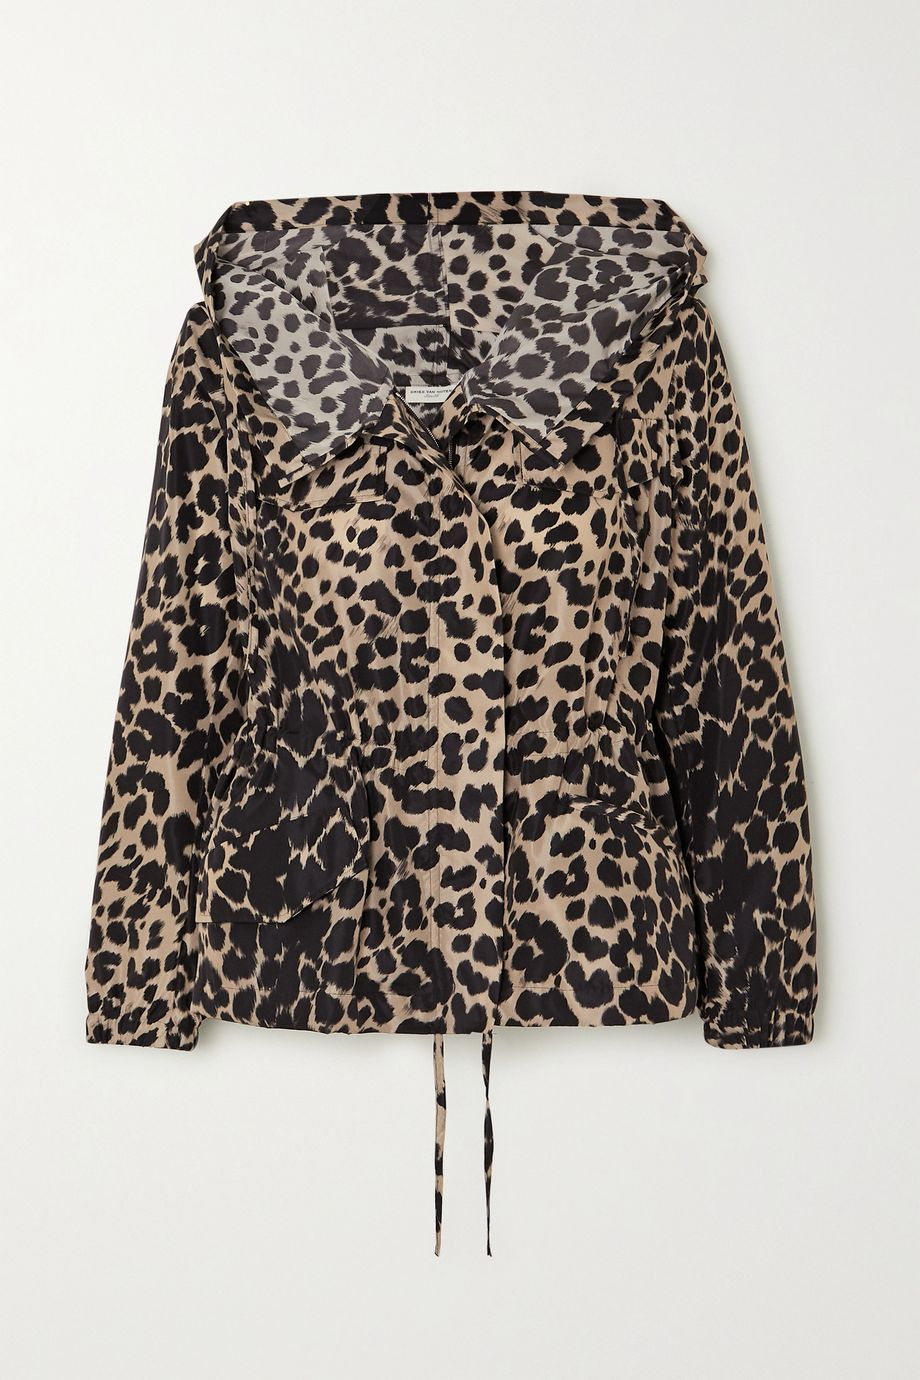 Dries Van Noten Jacke aus Shell mit Leopardenprint